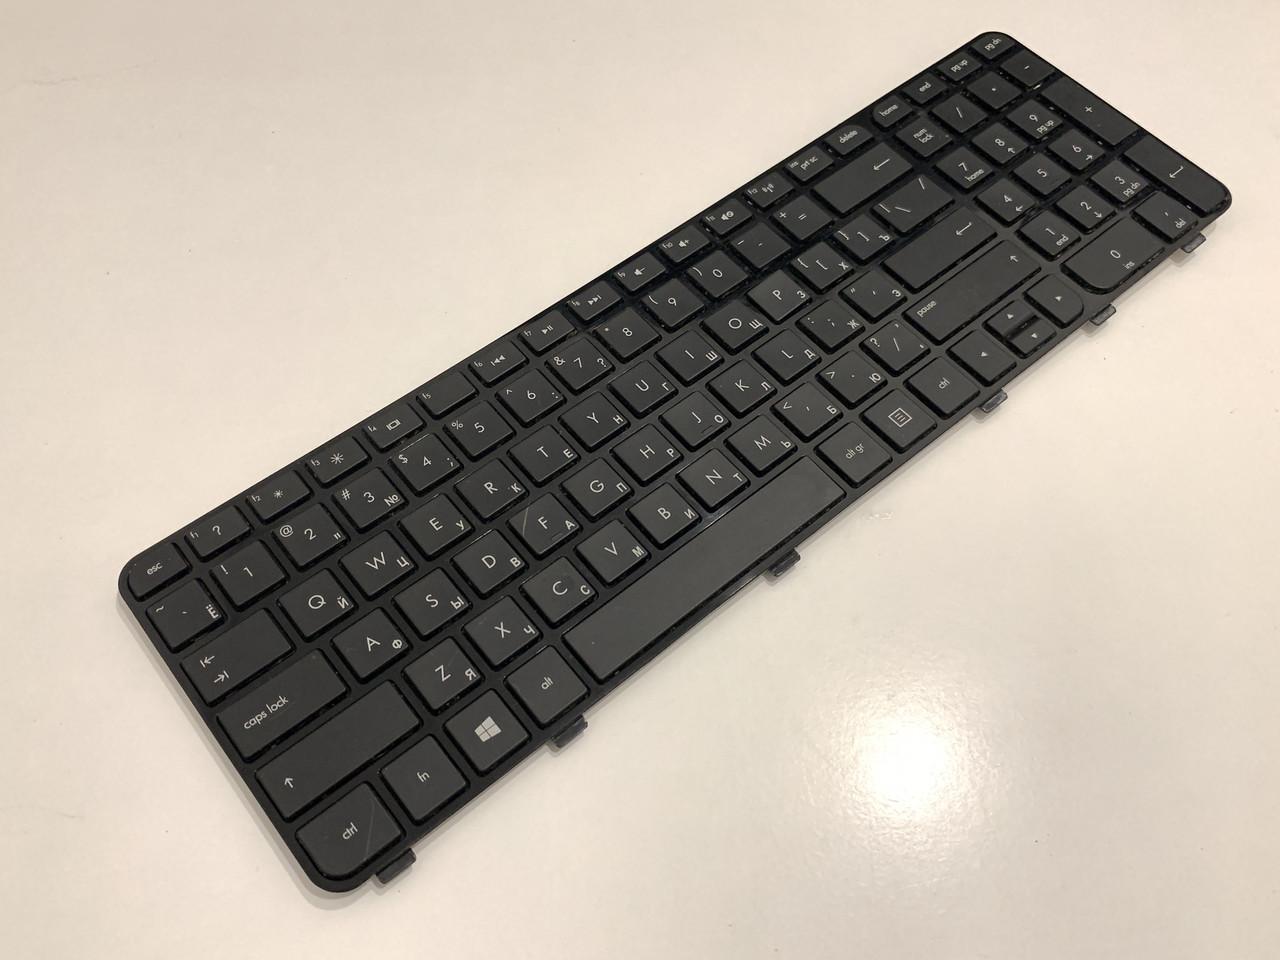 Запчасти для ноутбука HP ENVY dv6 7352sr   Клавиатура Sunrex v132430as2